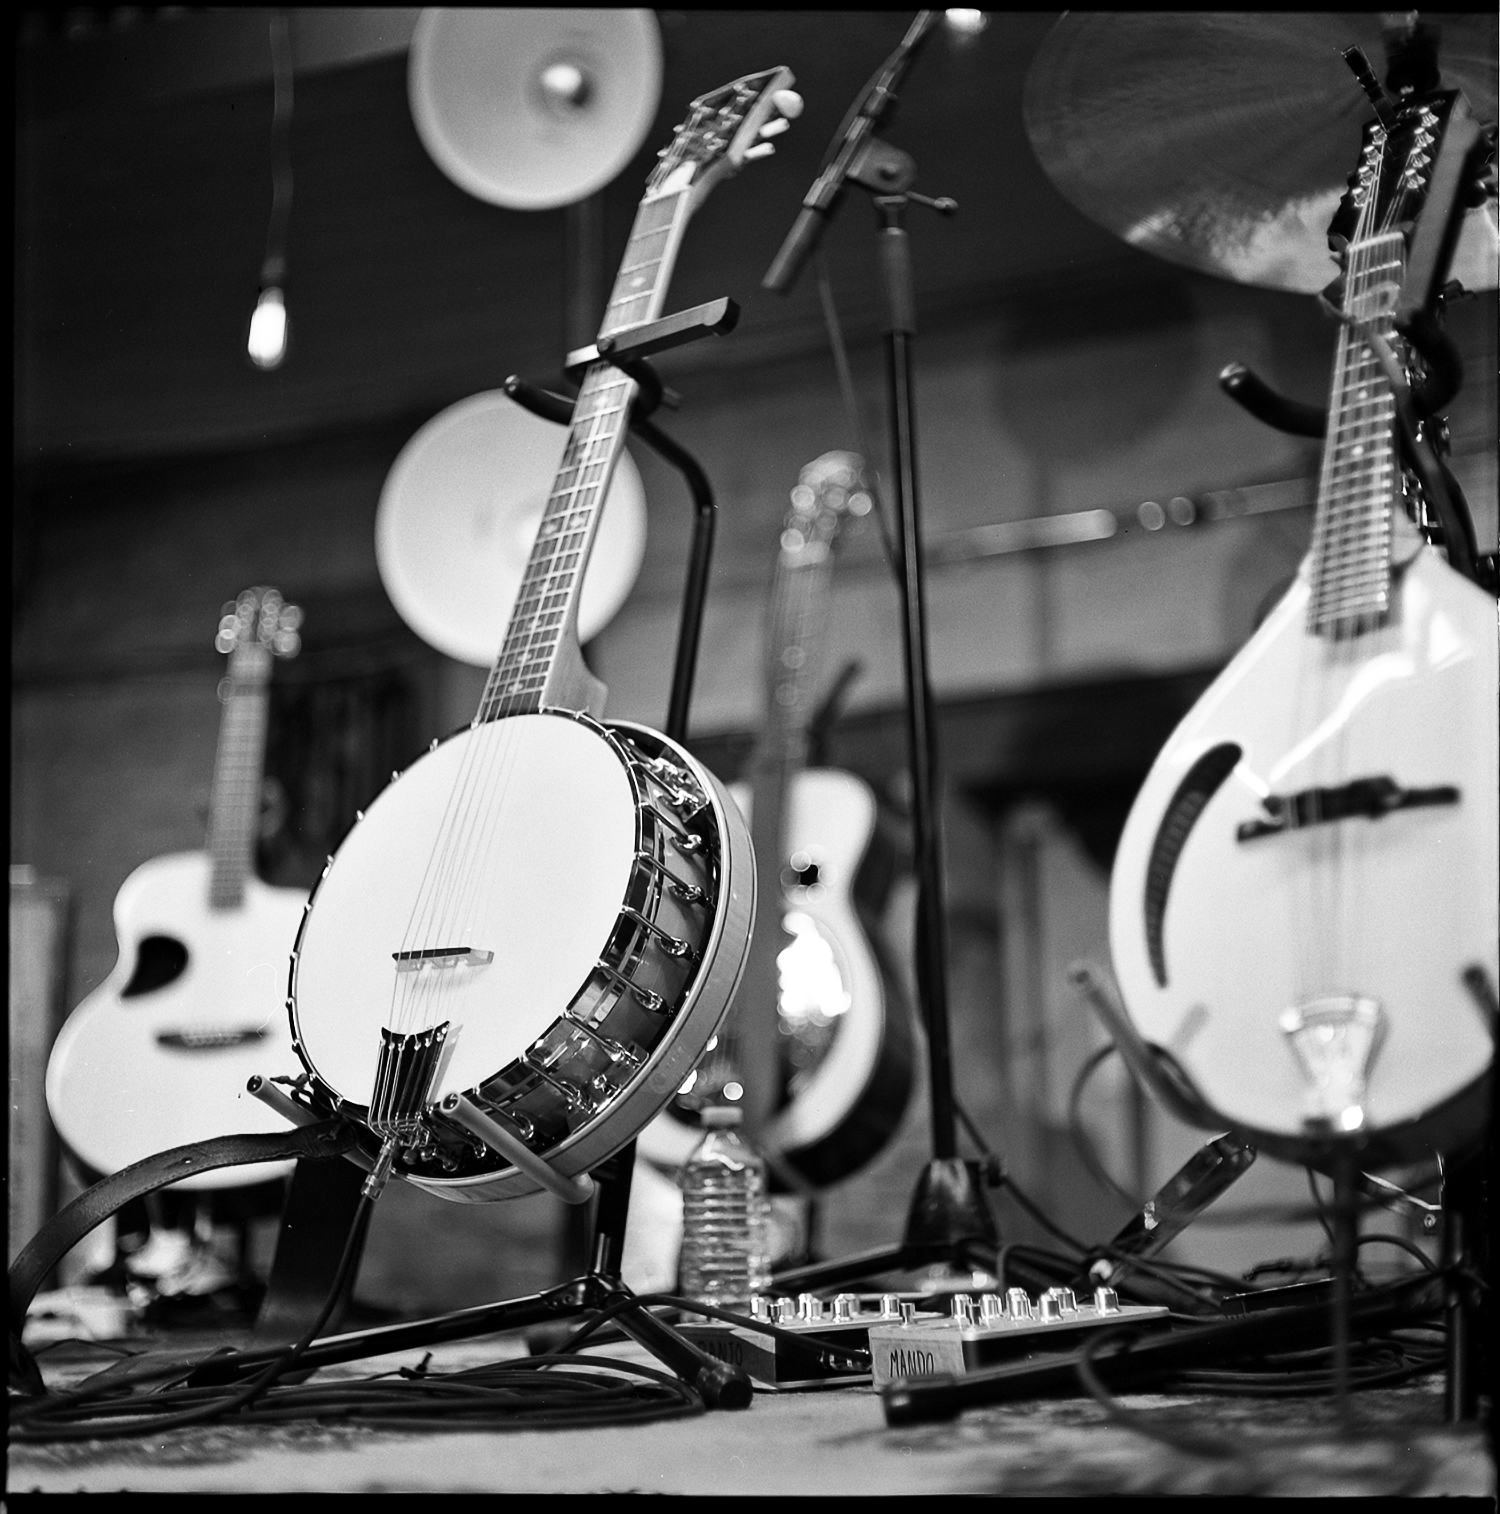 136-Kodak-TriX-400_CMT-Behind-The-Scenes_Banjo-Detail.JPG